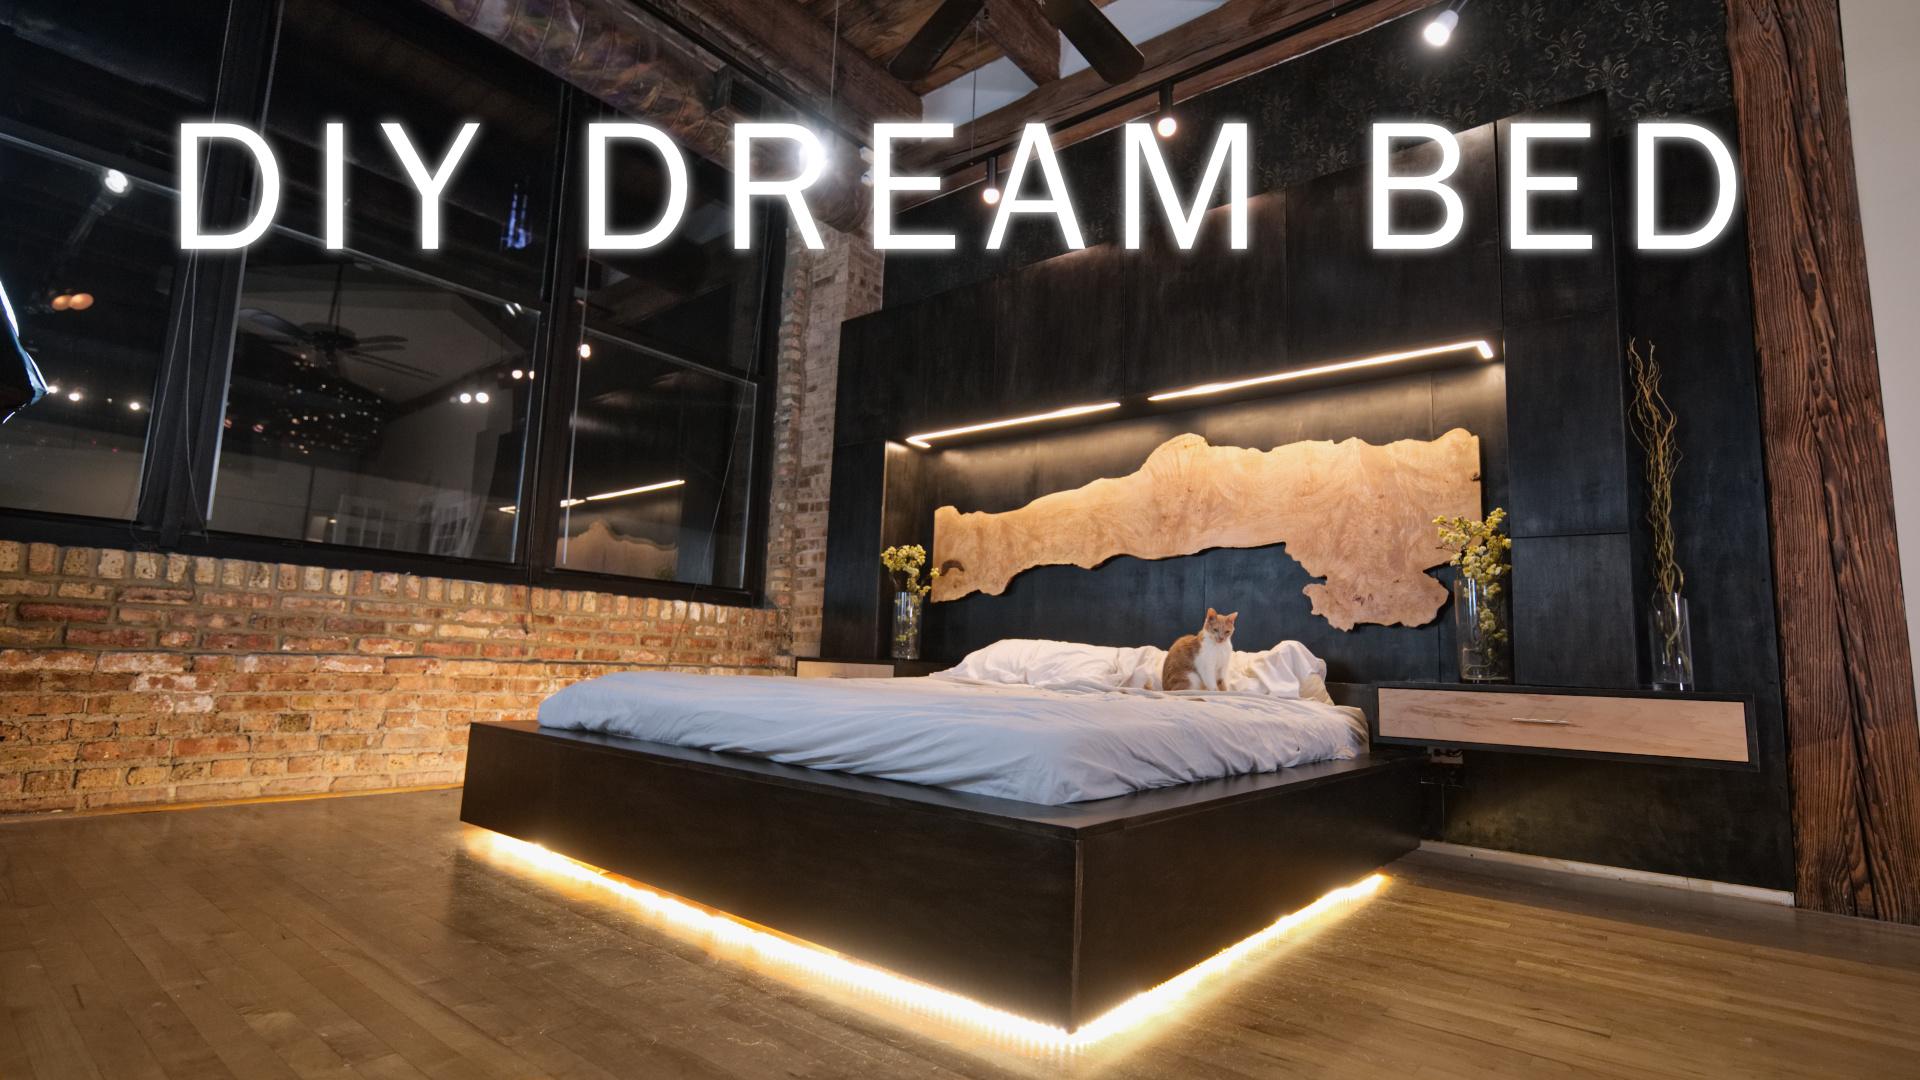 Diy Dream Bed Modern Bedroom Renovation For My Loft Woodworking Modustrial Maker